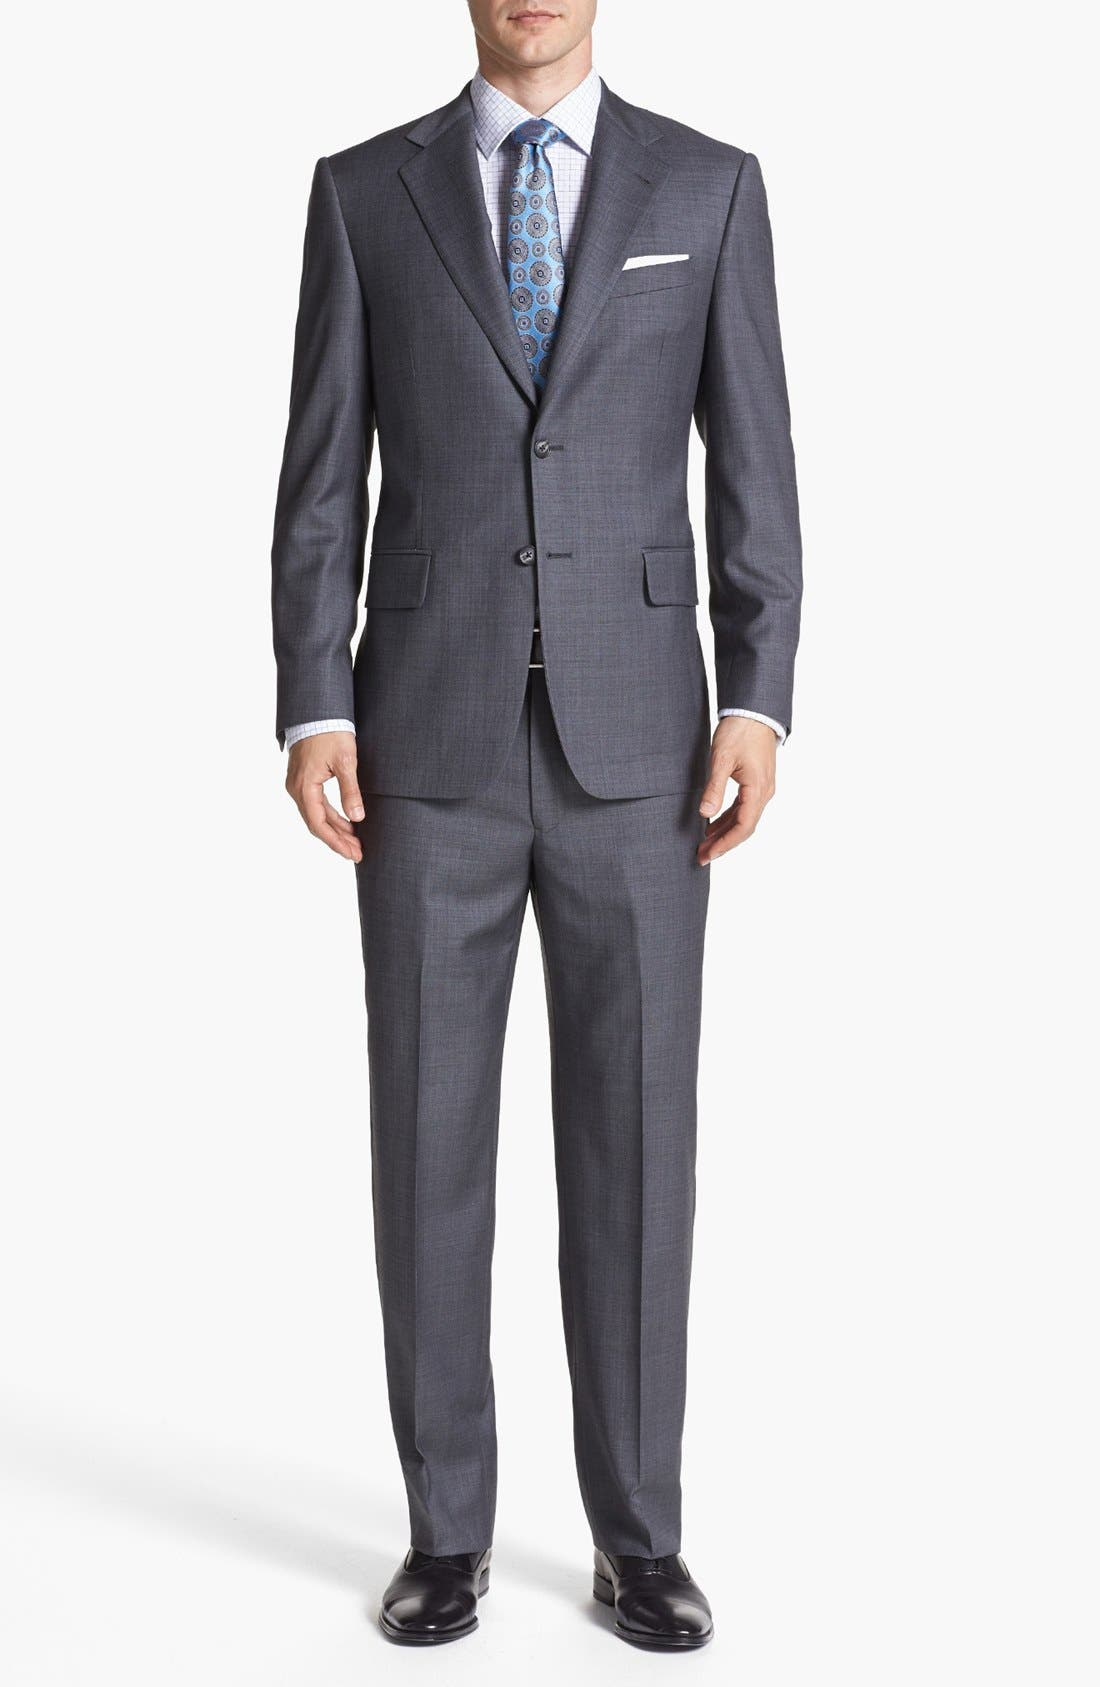 Main Image - Joseph Abboud 'Signature Silver' Wool Suit